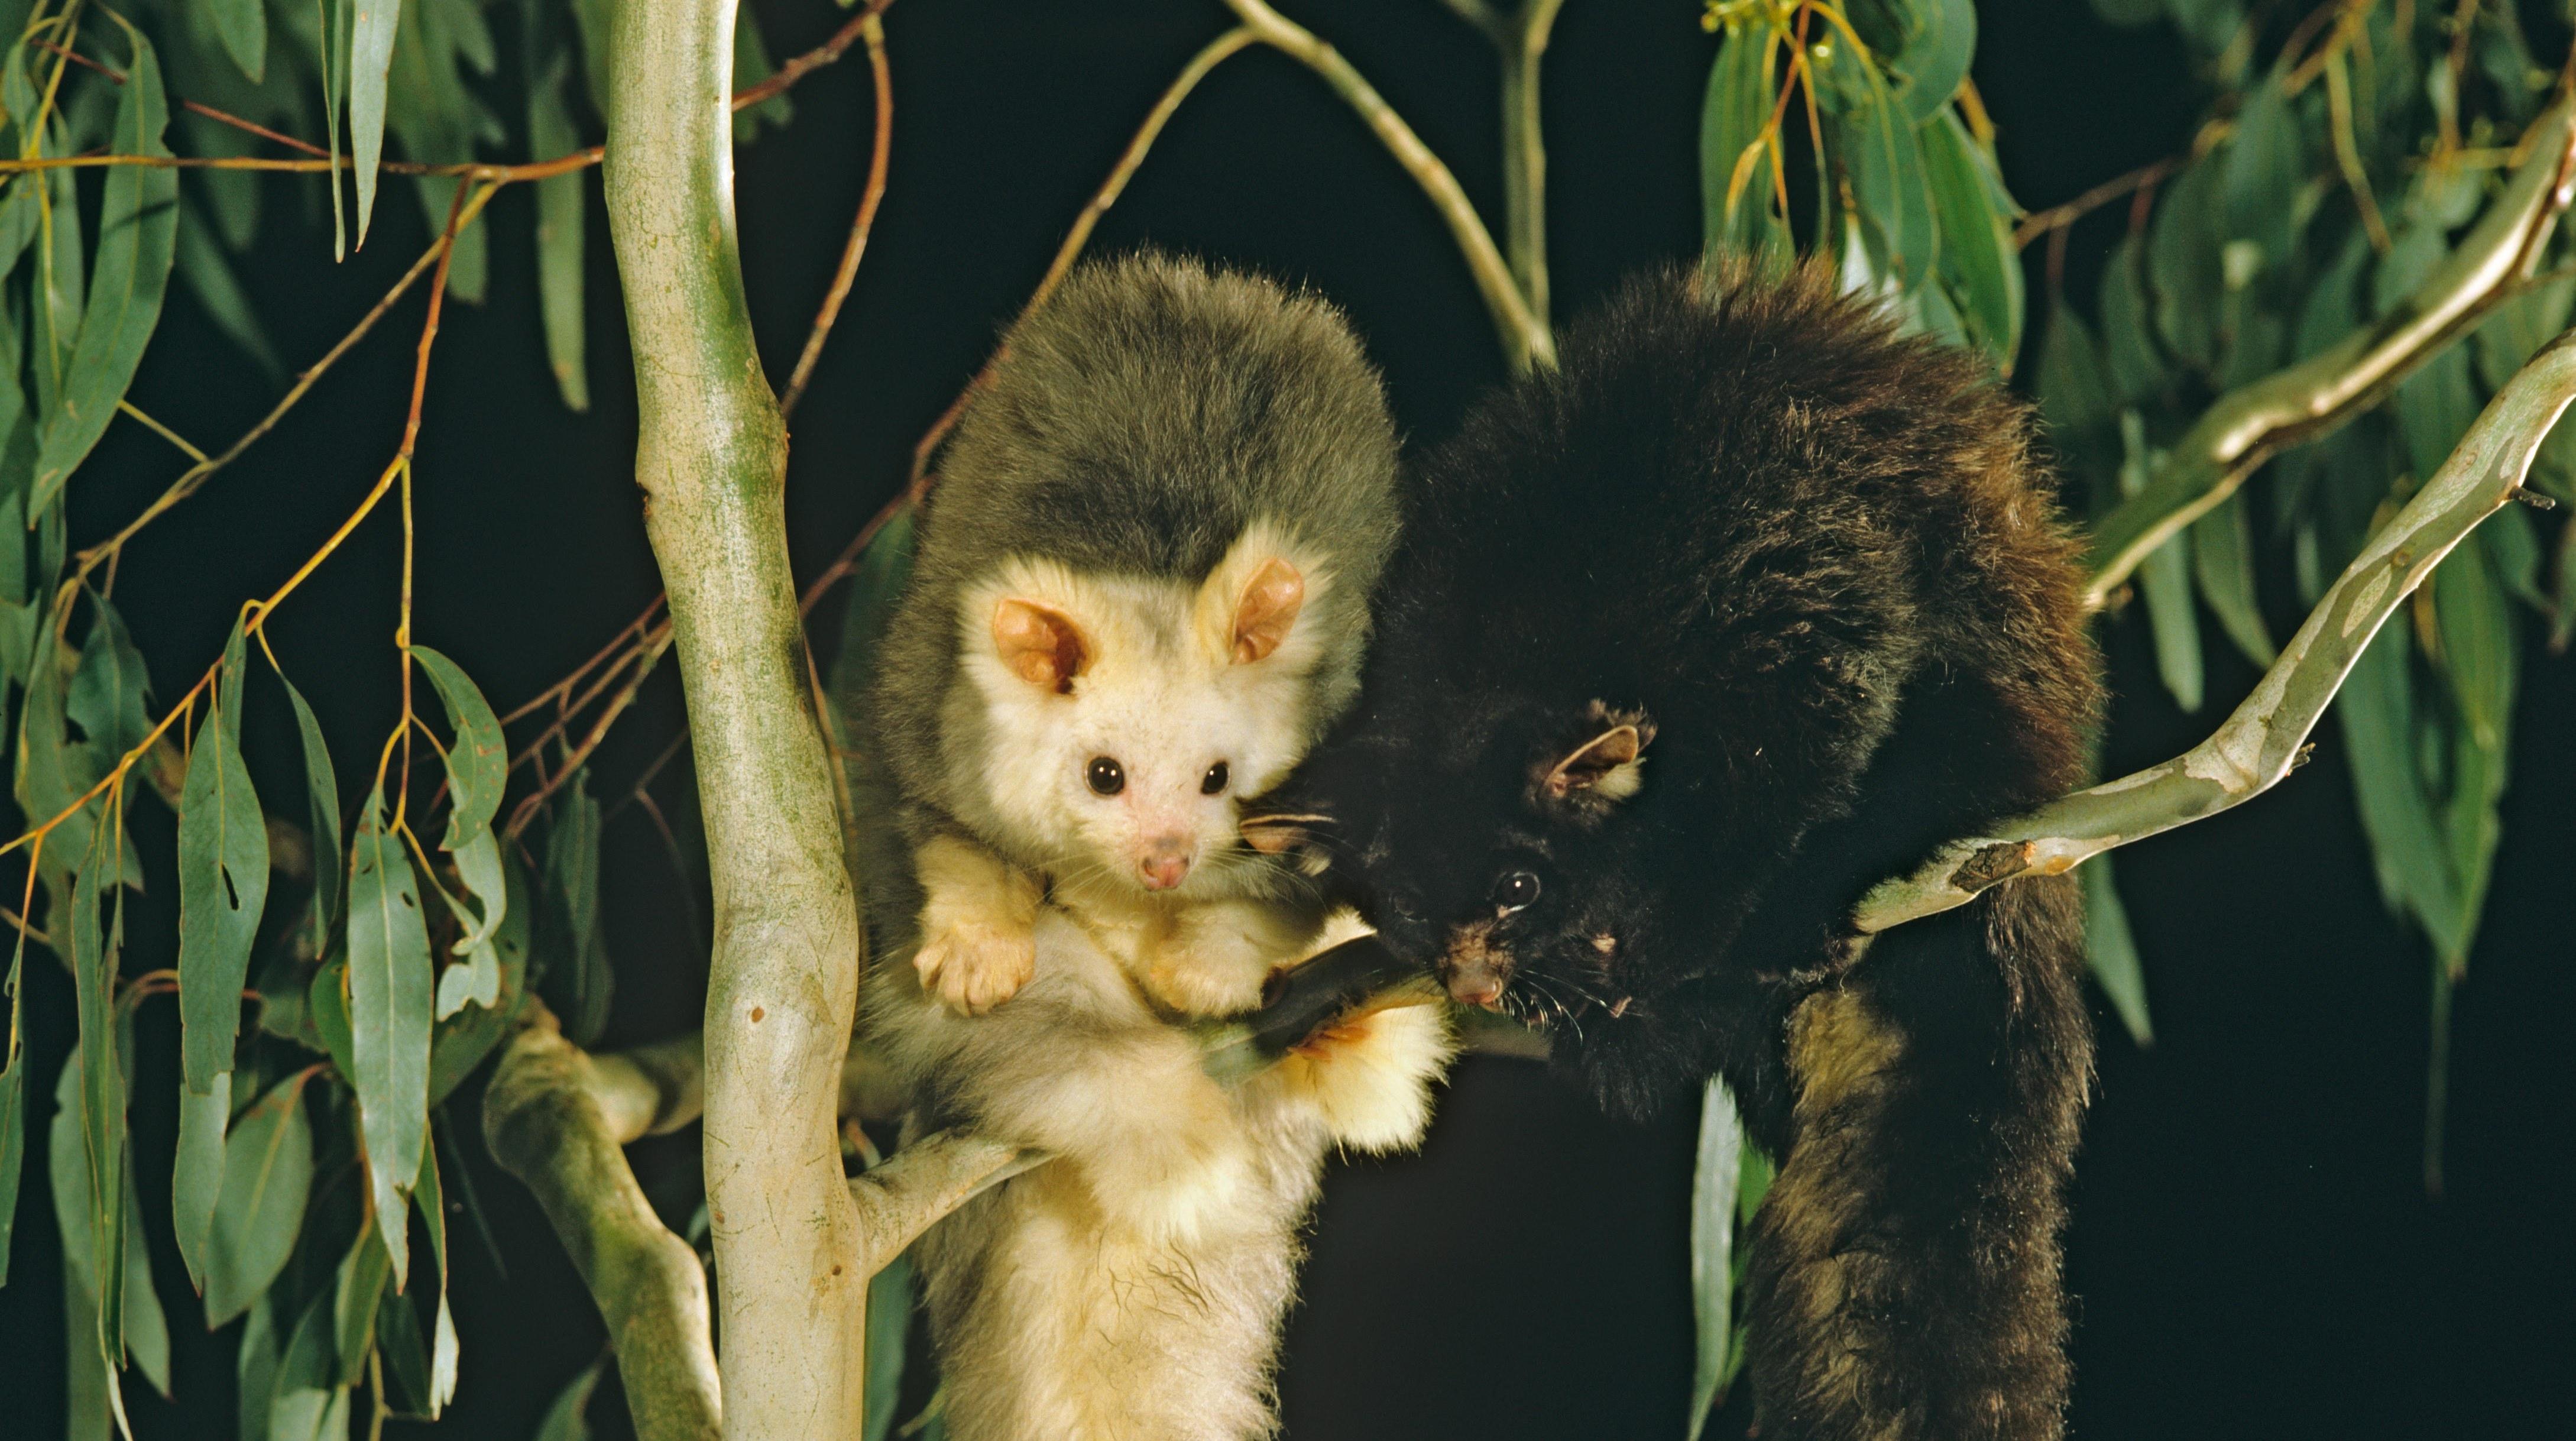 Have you met Australia's largest gliding possum?